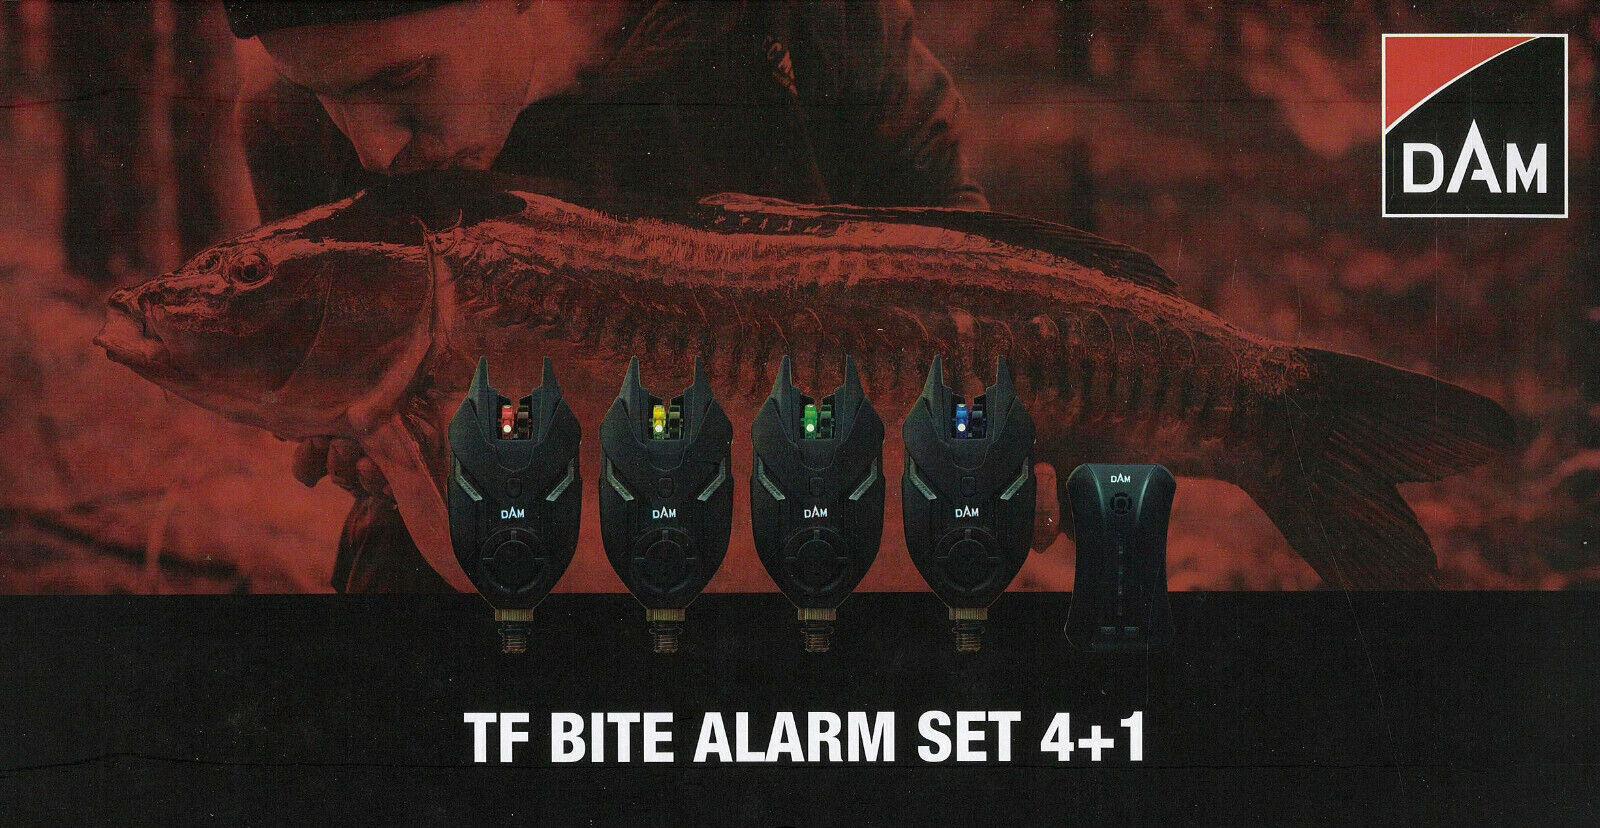 DAM ® TF Bite Alarm Set 4+1 Funk Bissanzeiger Set LED red-yellow-green-blue +Koffer